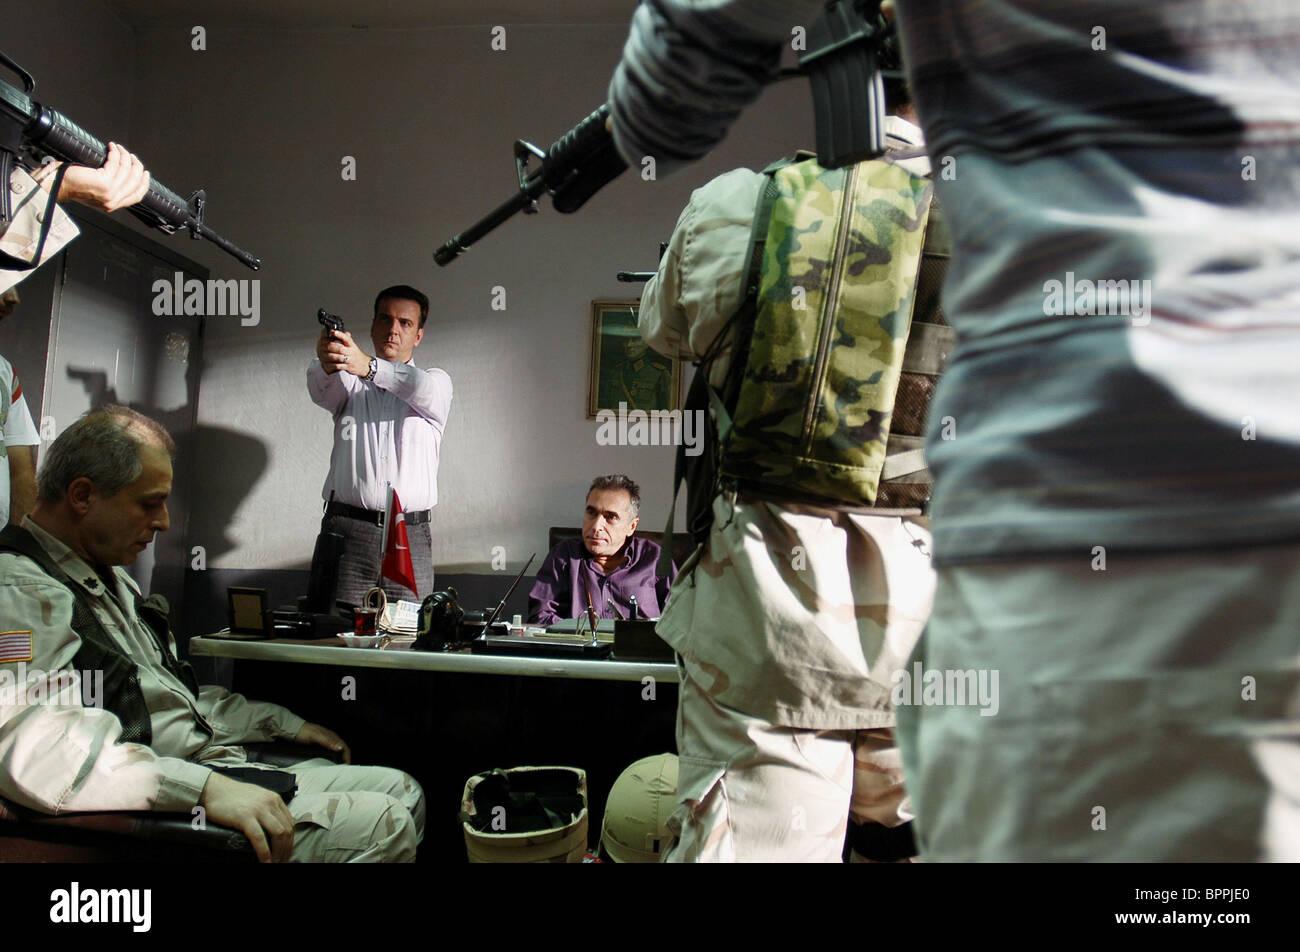 SCENE WITH GUNS VALLEY OF THE WOLVES: IRAQ; KURTLAR VADISI - IRAK (2006) - Stock Image